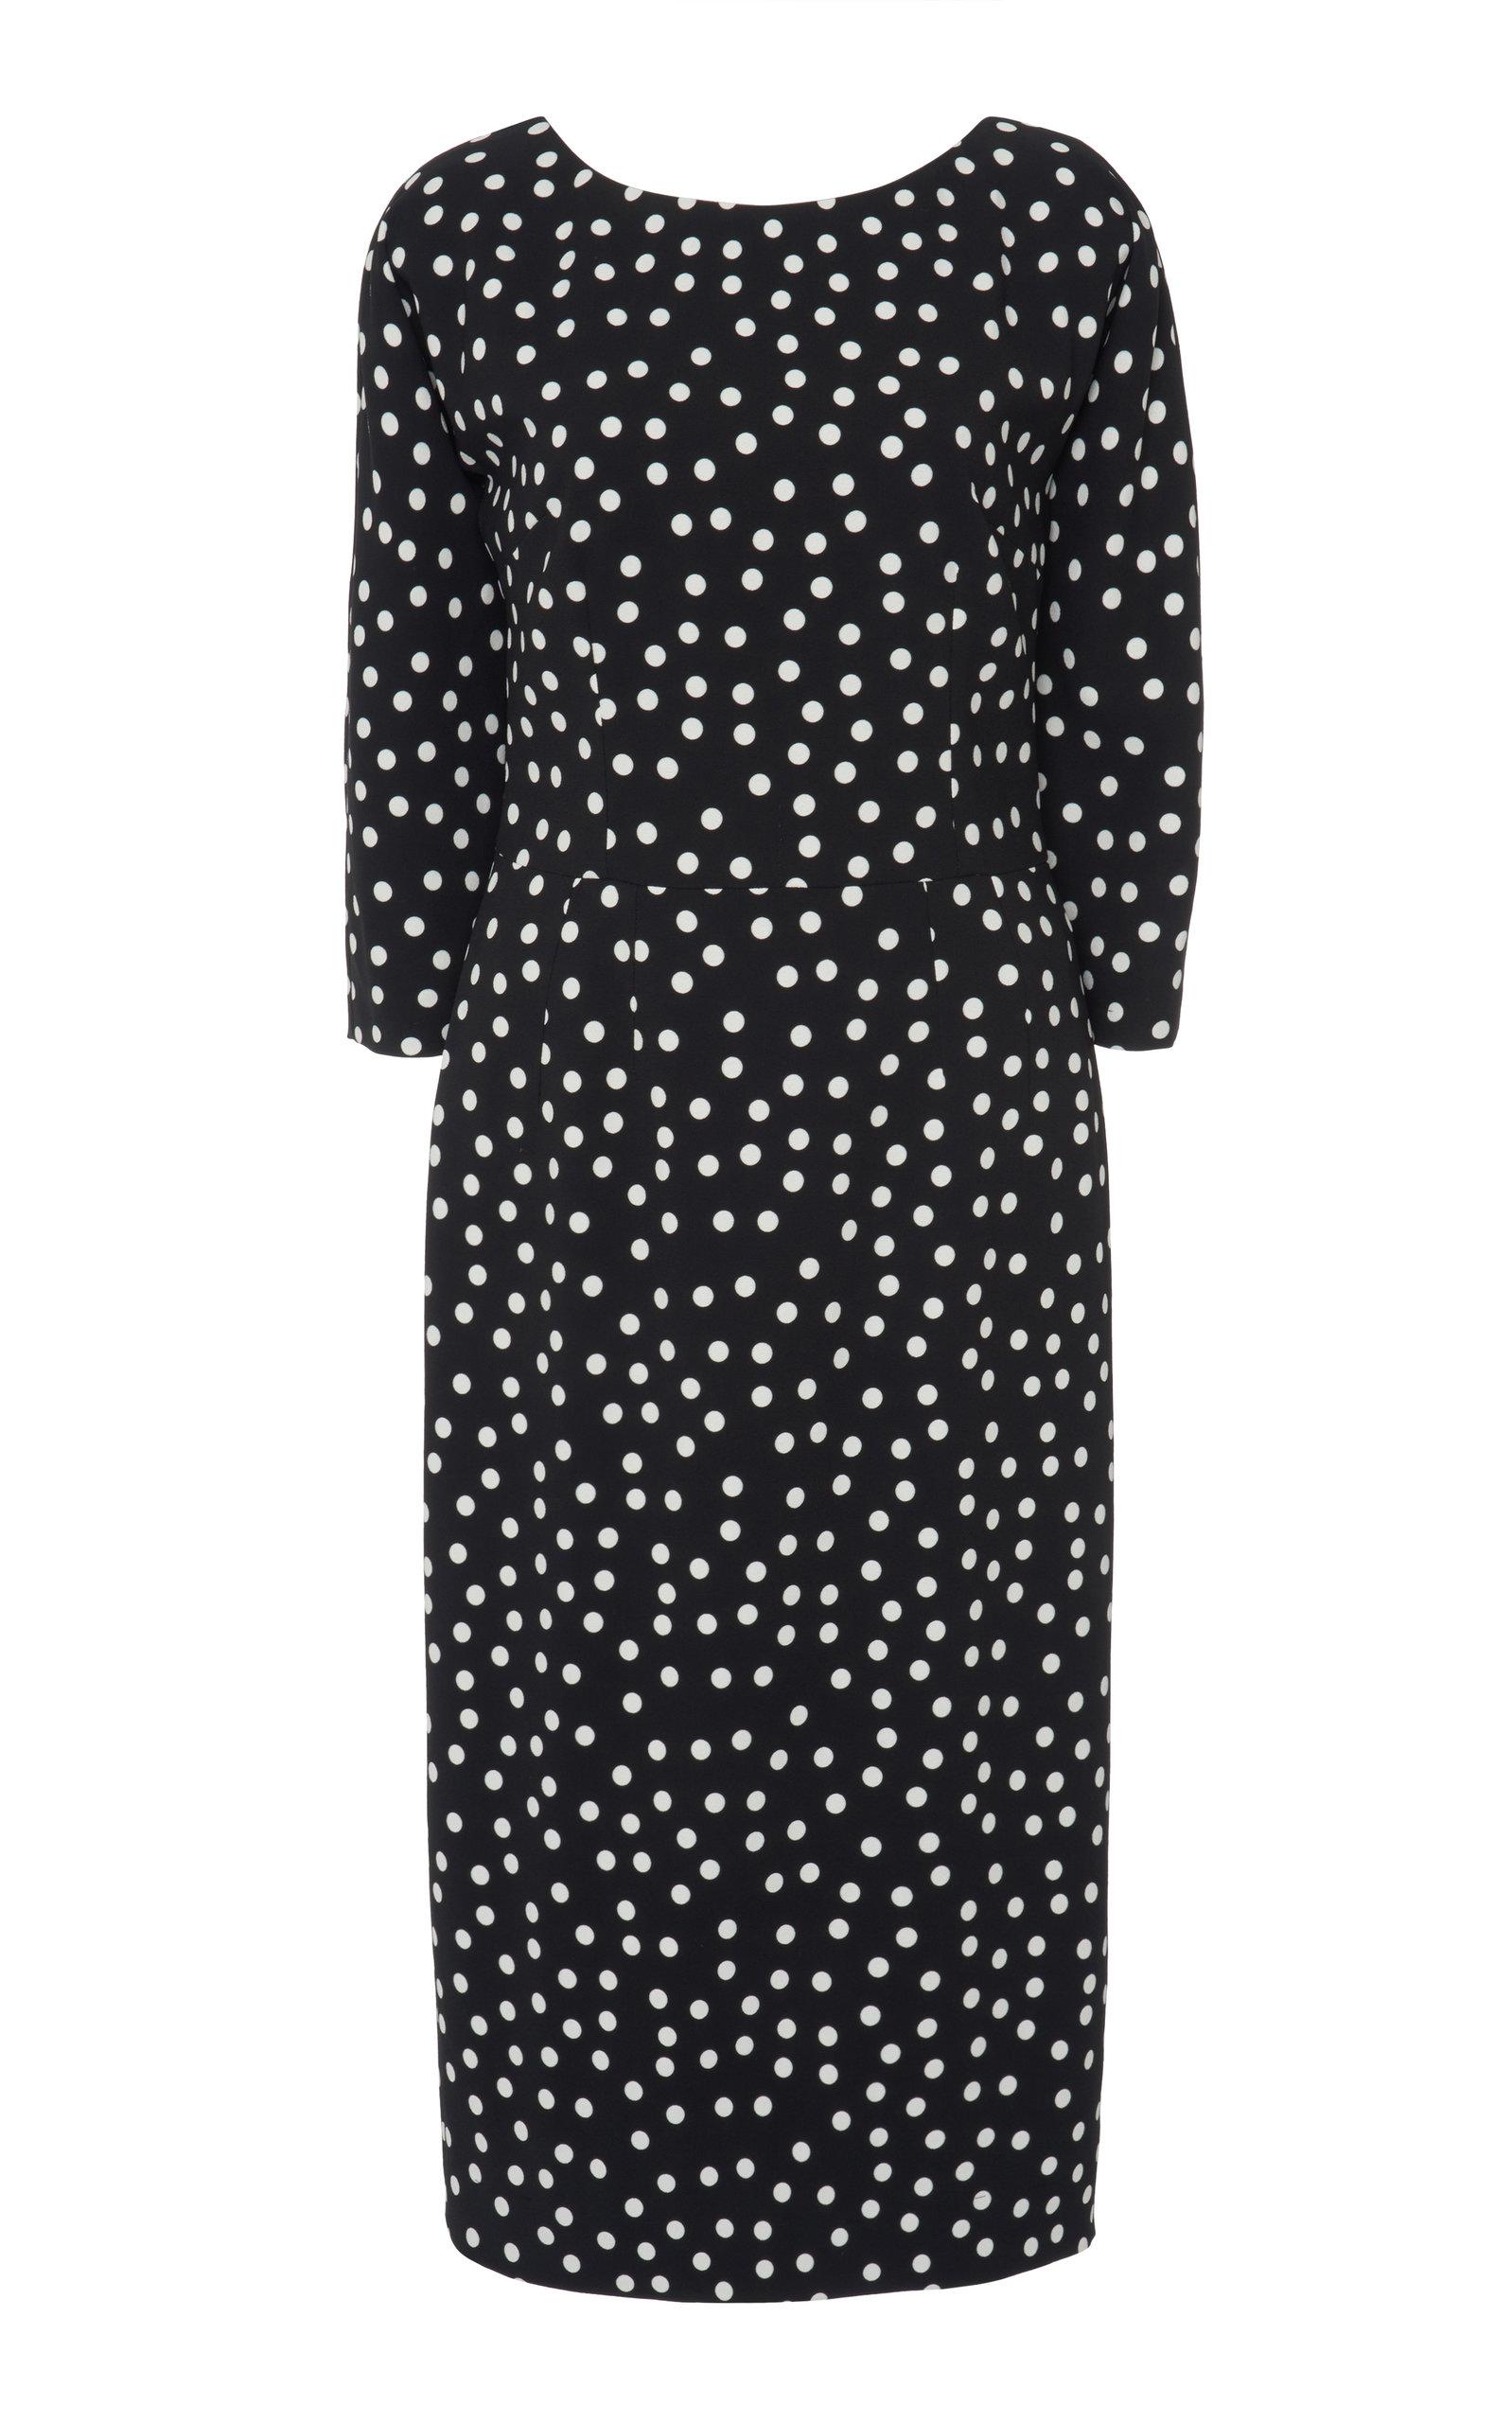 Buy Dolce & Gabbana Polka-Dot Stretch-Crepe Midi Dress online, shop Dolce & Gabbana at the best price